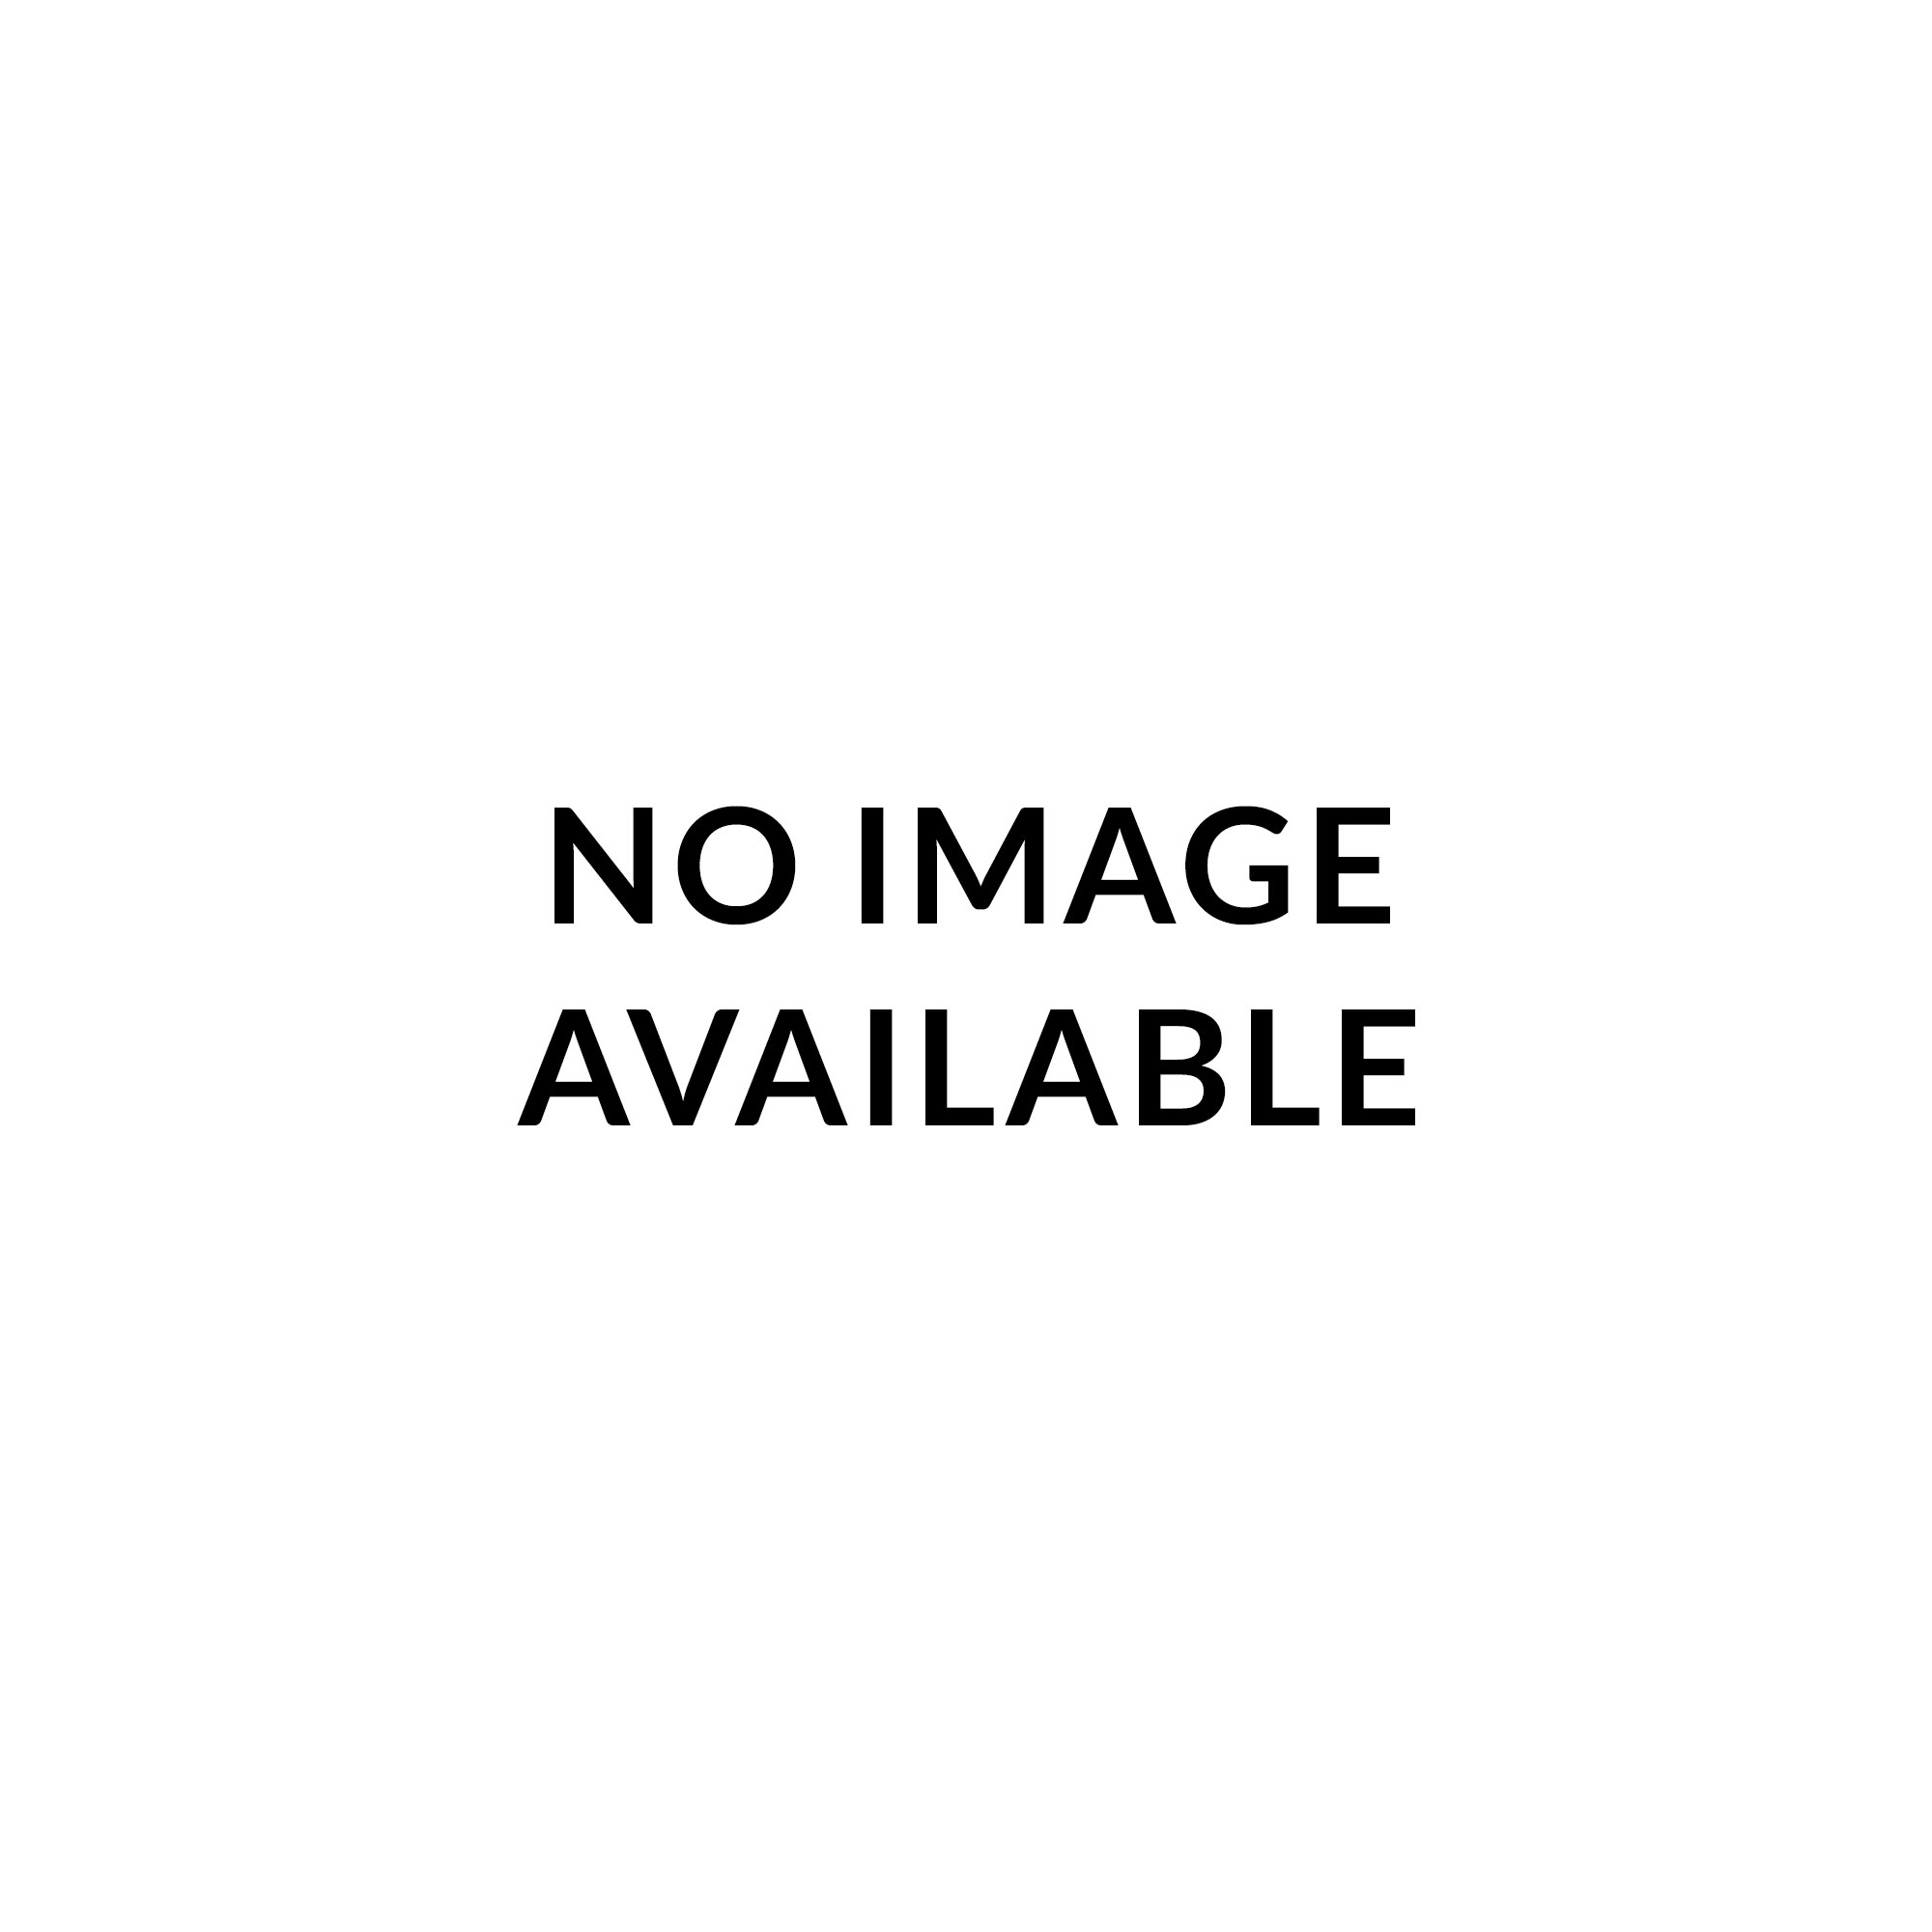 PRS HFS Treble Pickup Nickel ACC-3020